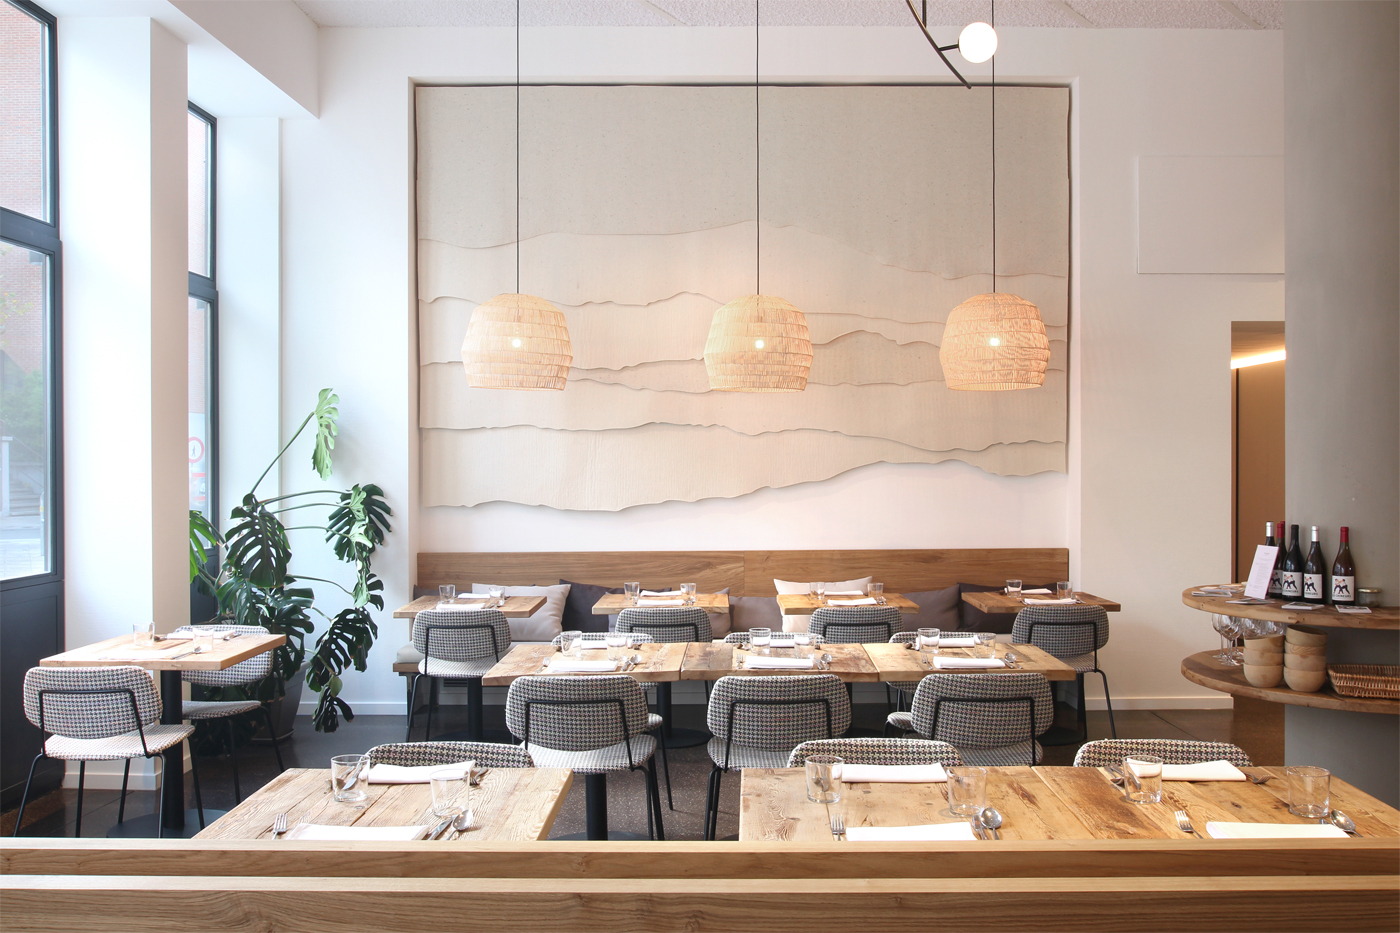 Tero brussels 39 kitchen for Interior design keywords